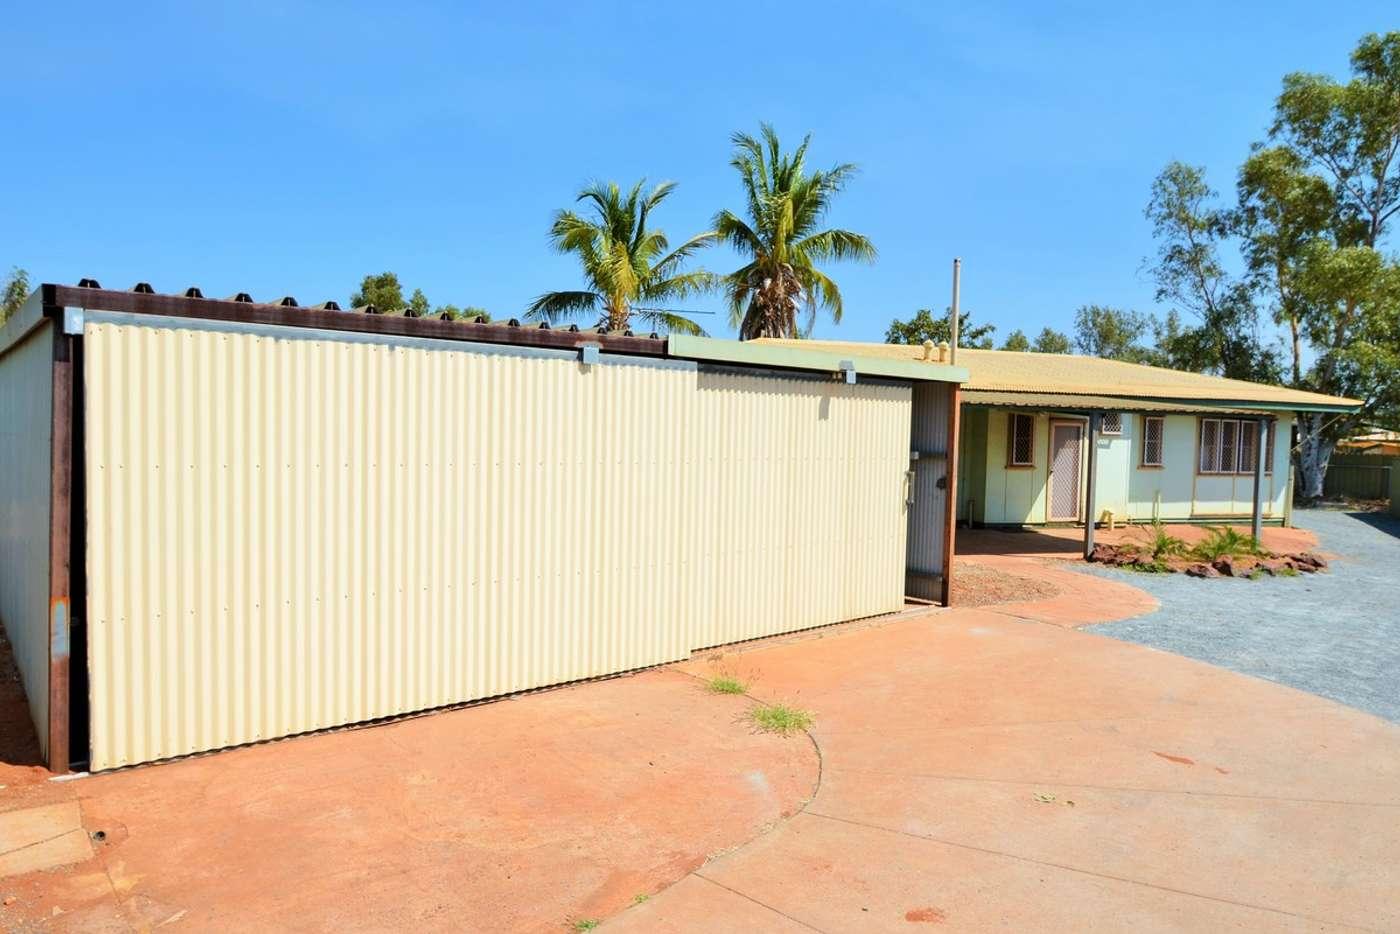 Main view of Homely house listing, 11 Pedlar Street, South Hedland WA 6722